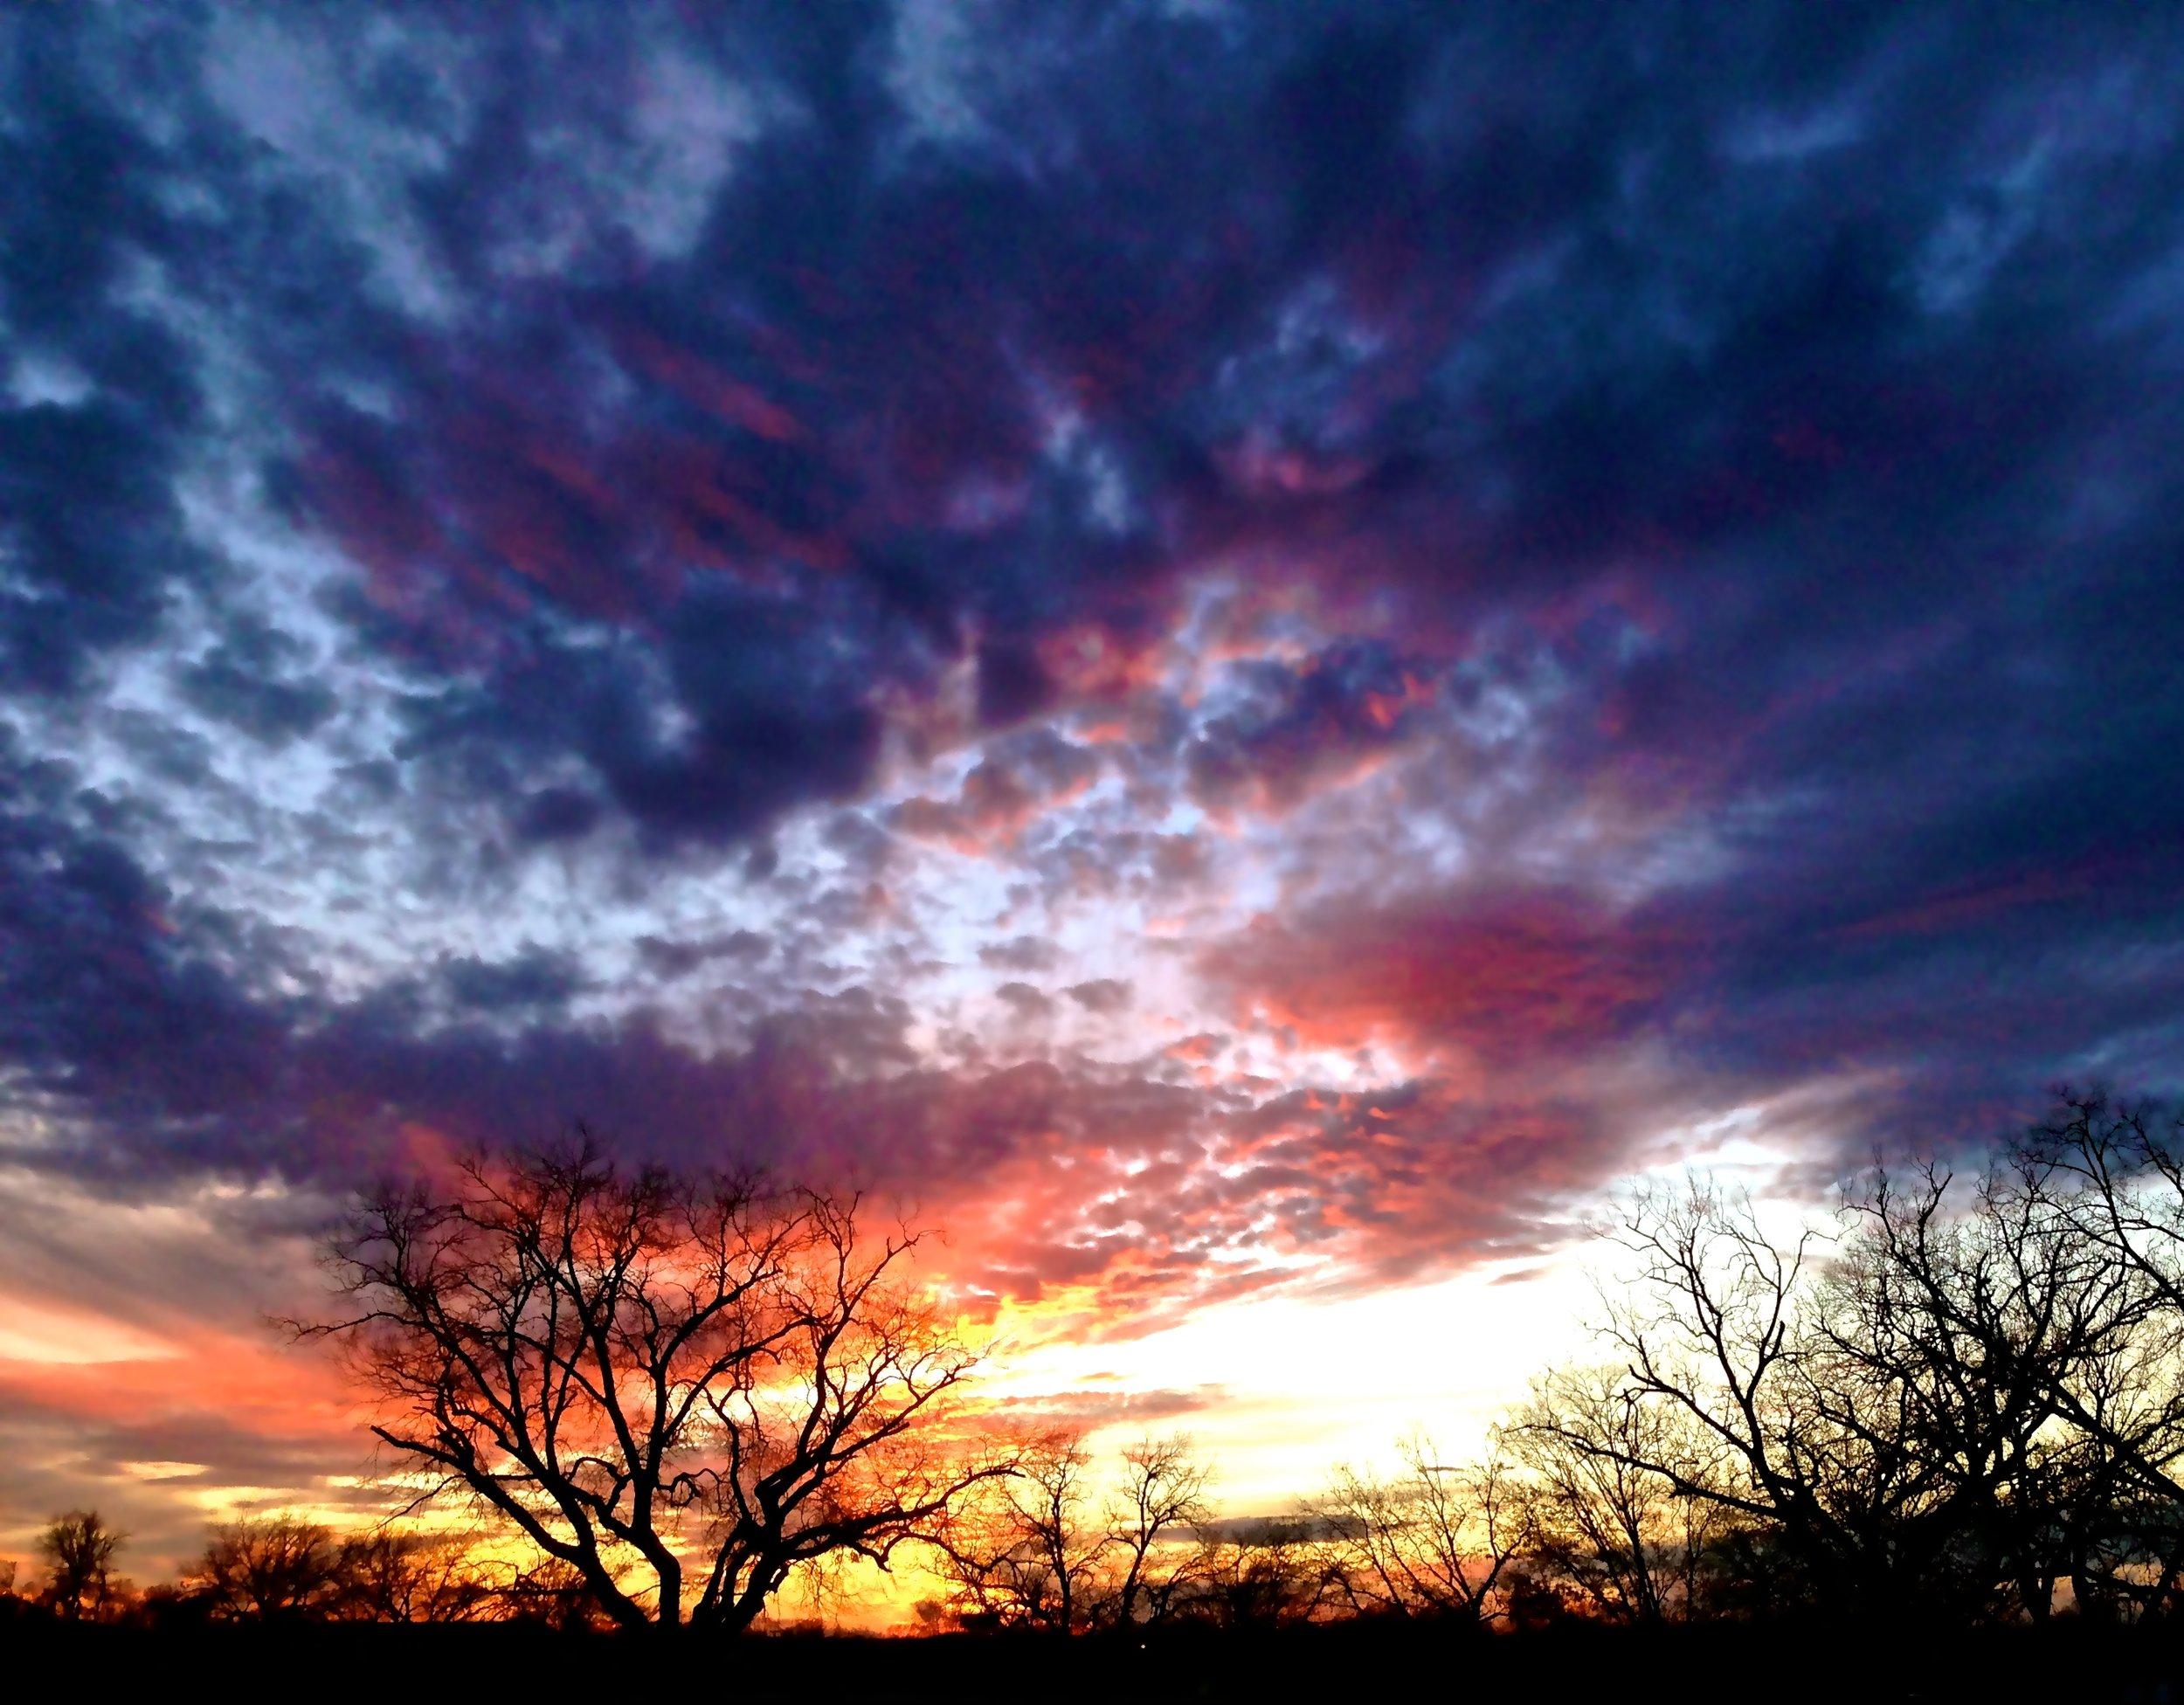 20496922-Texas sunset.jpg